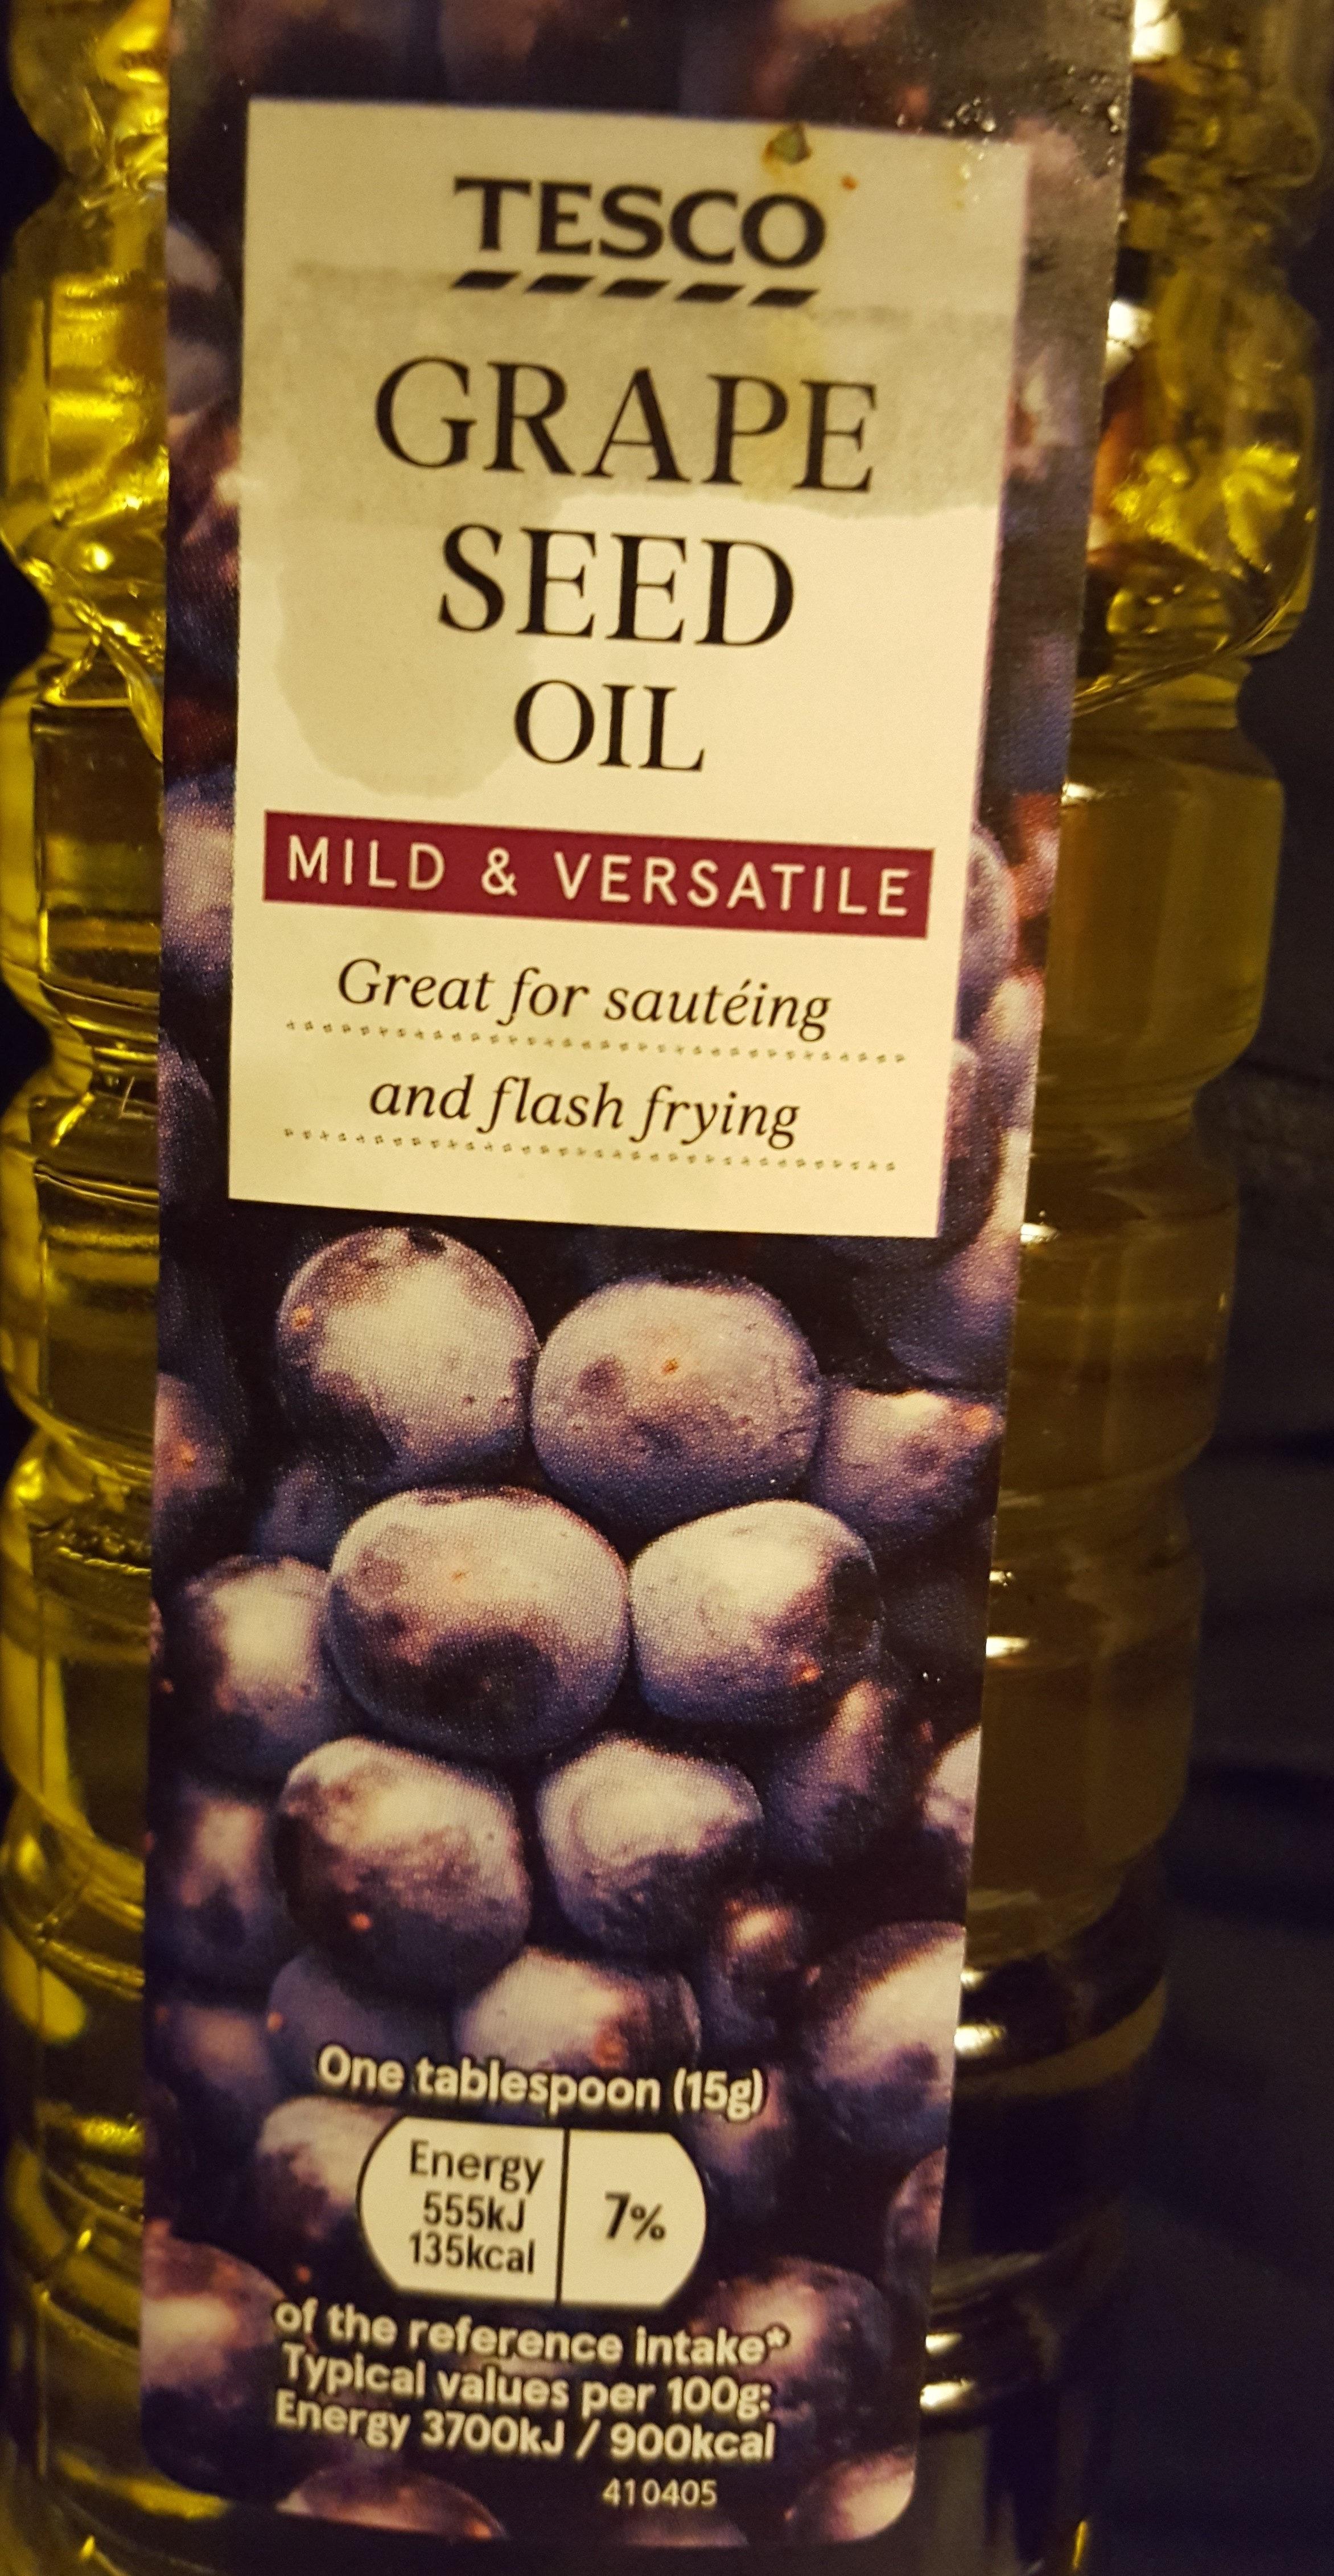 Grape Seed Oil Tesco 500 Ml